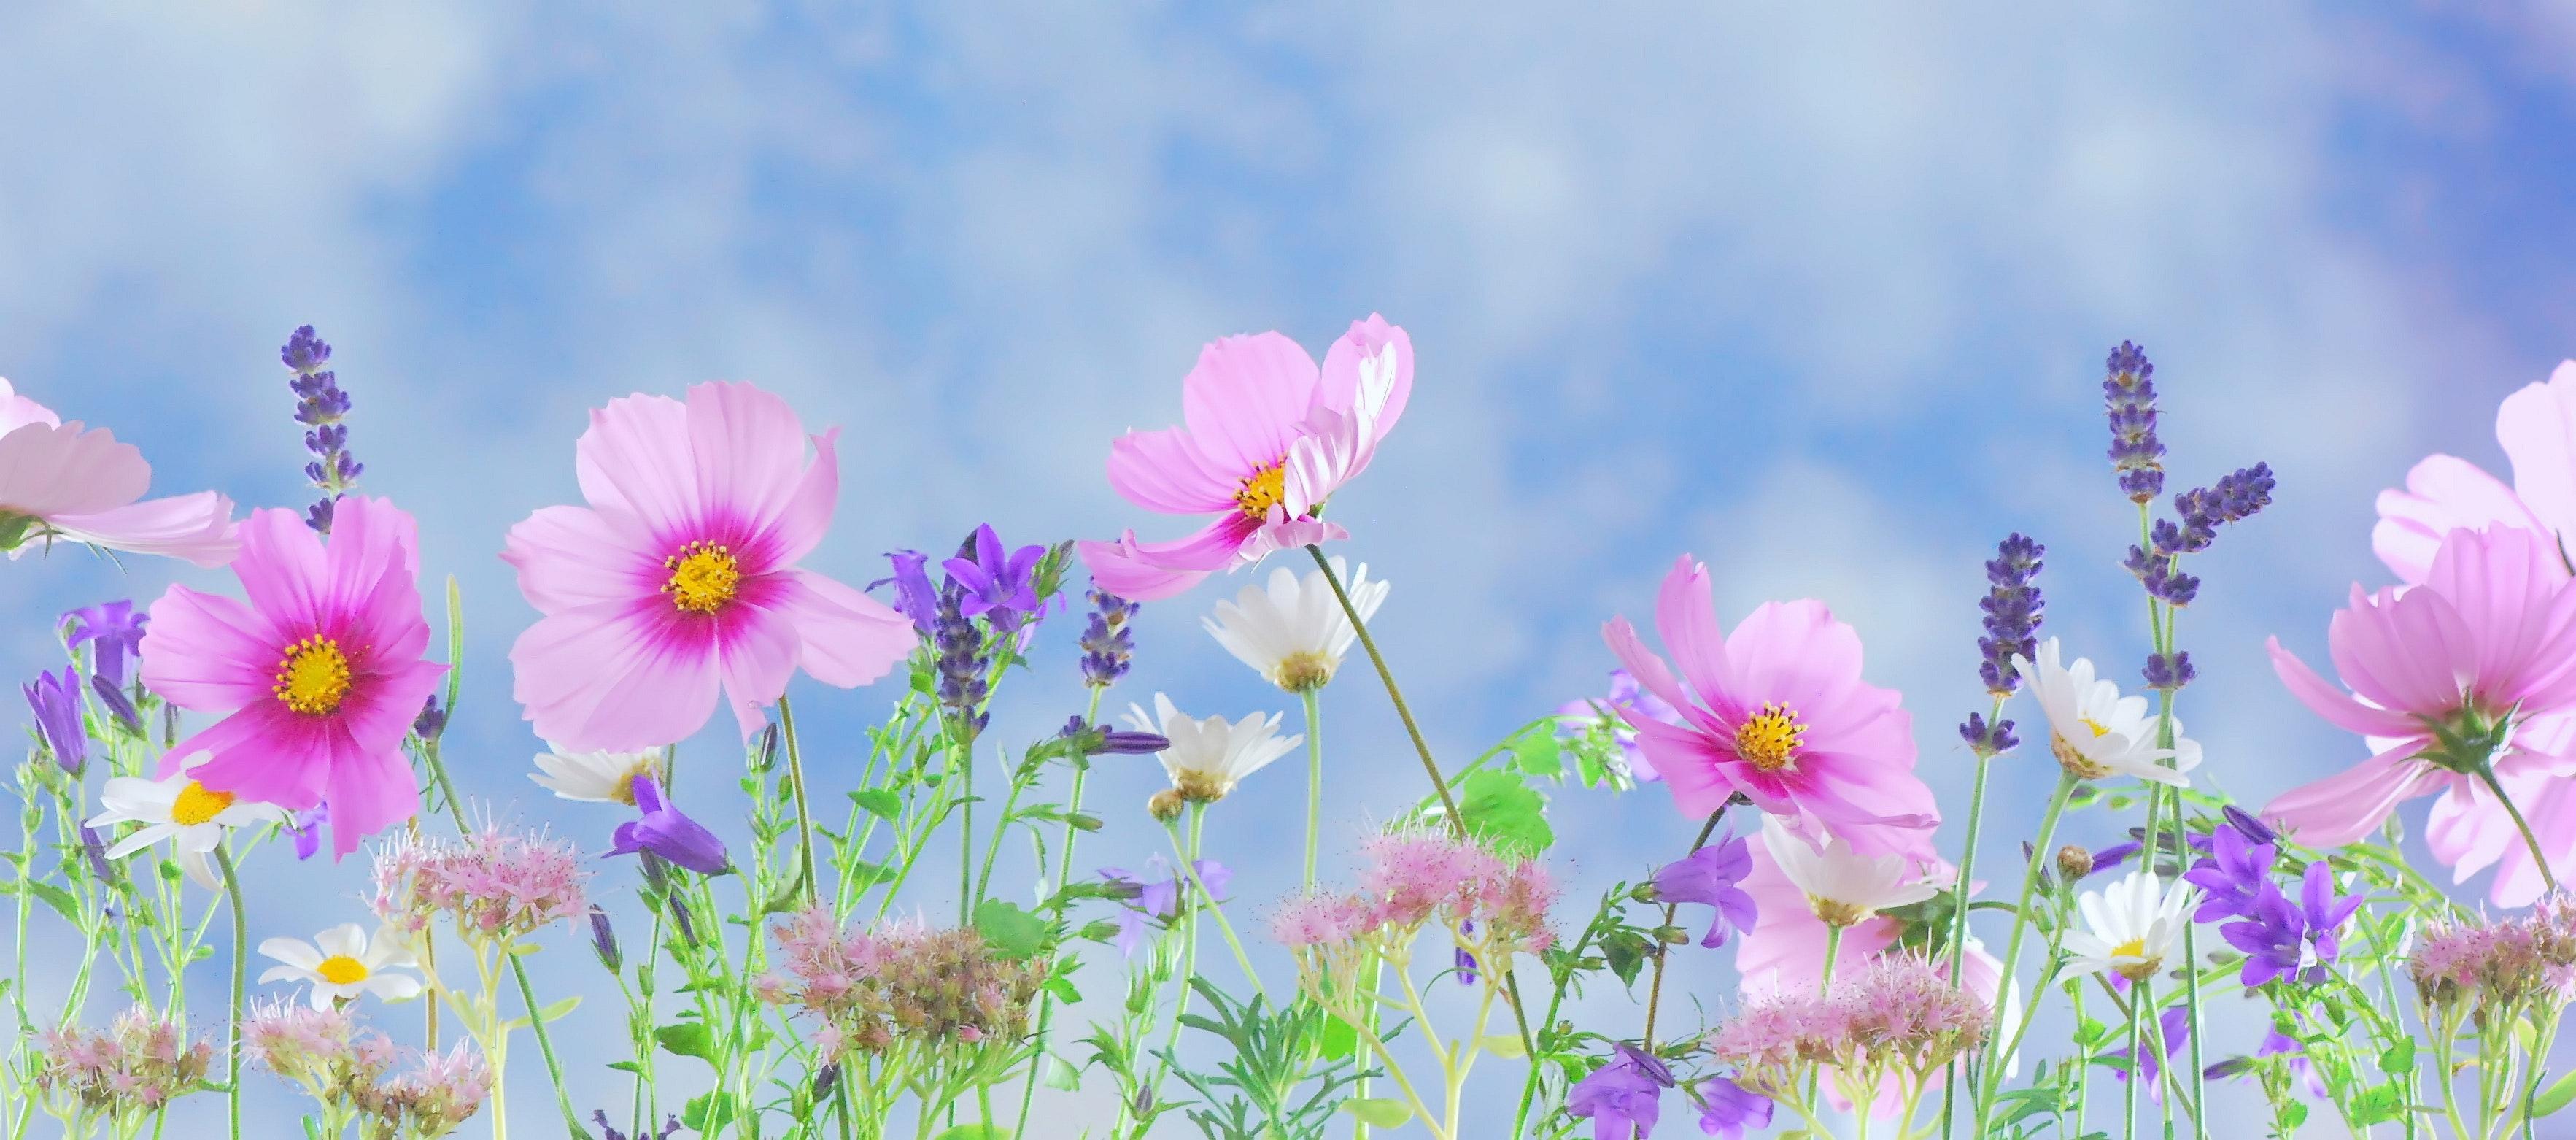 1000 Beautiful Spring Flowers Photos Pexels Free Stock Photos